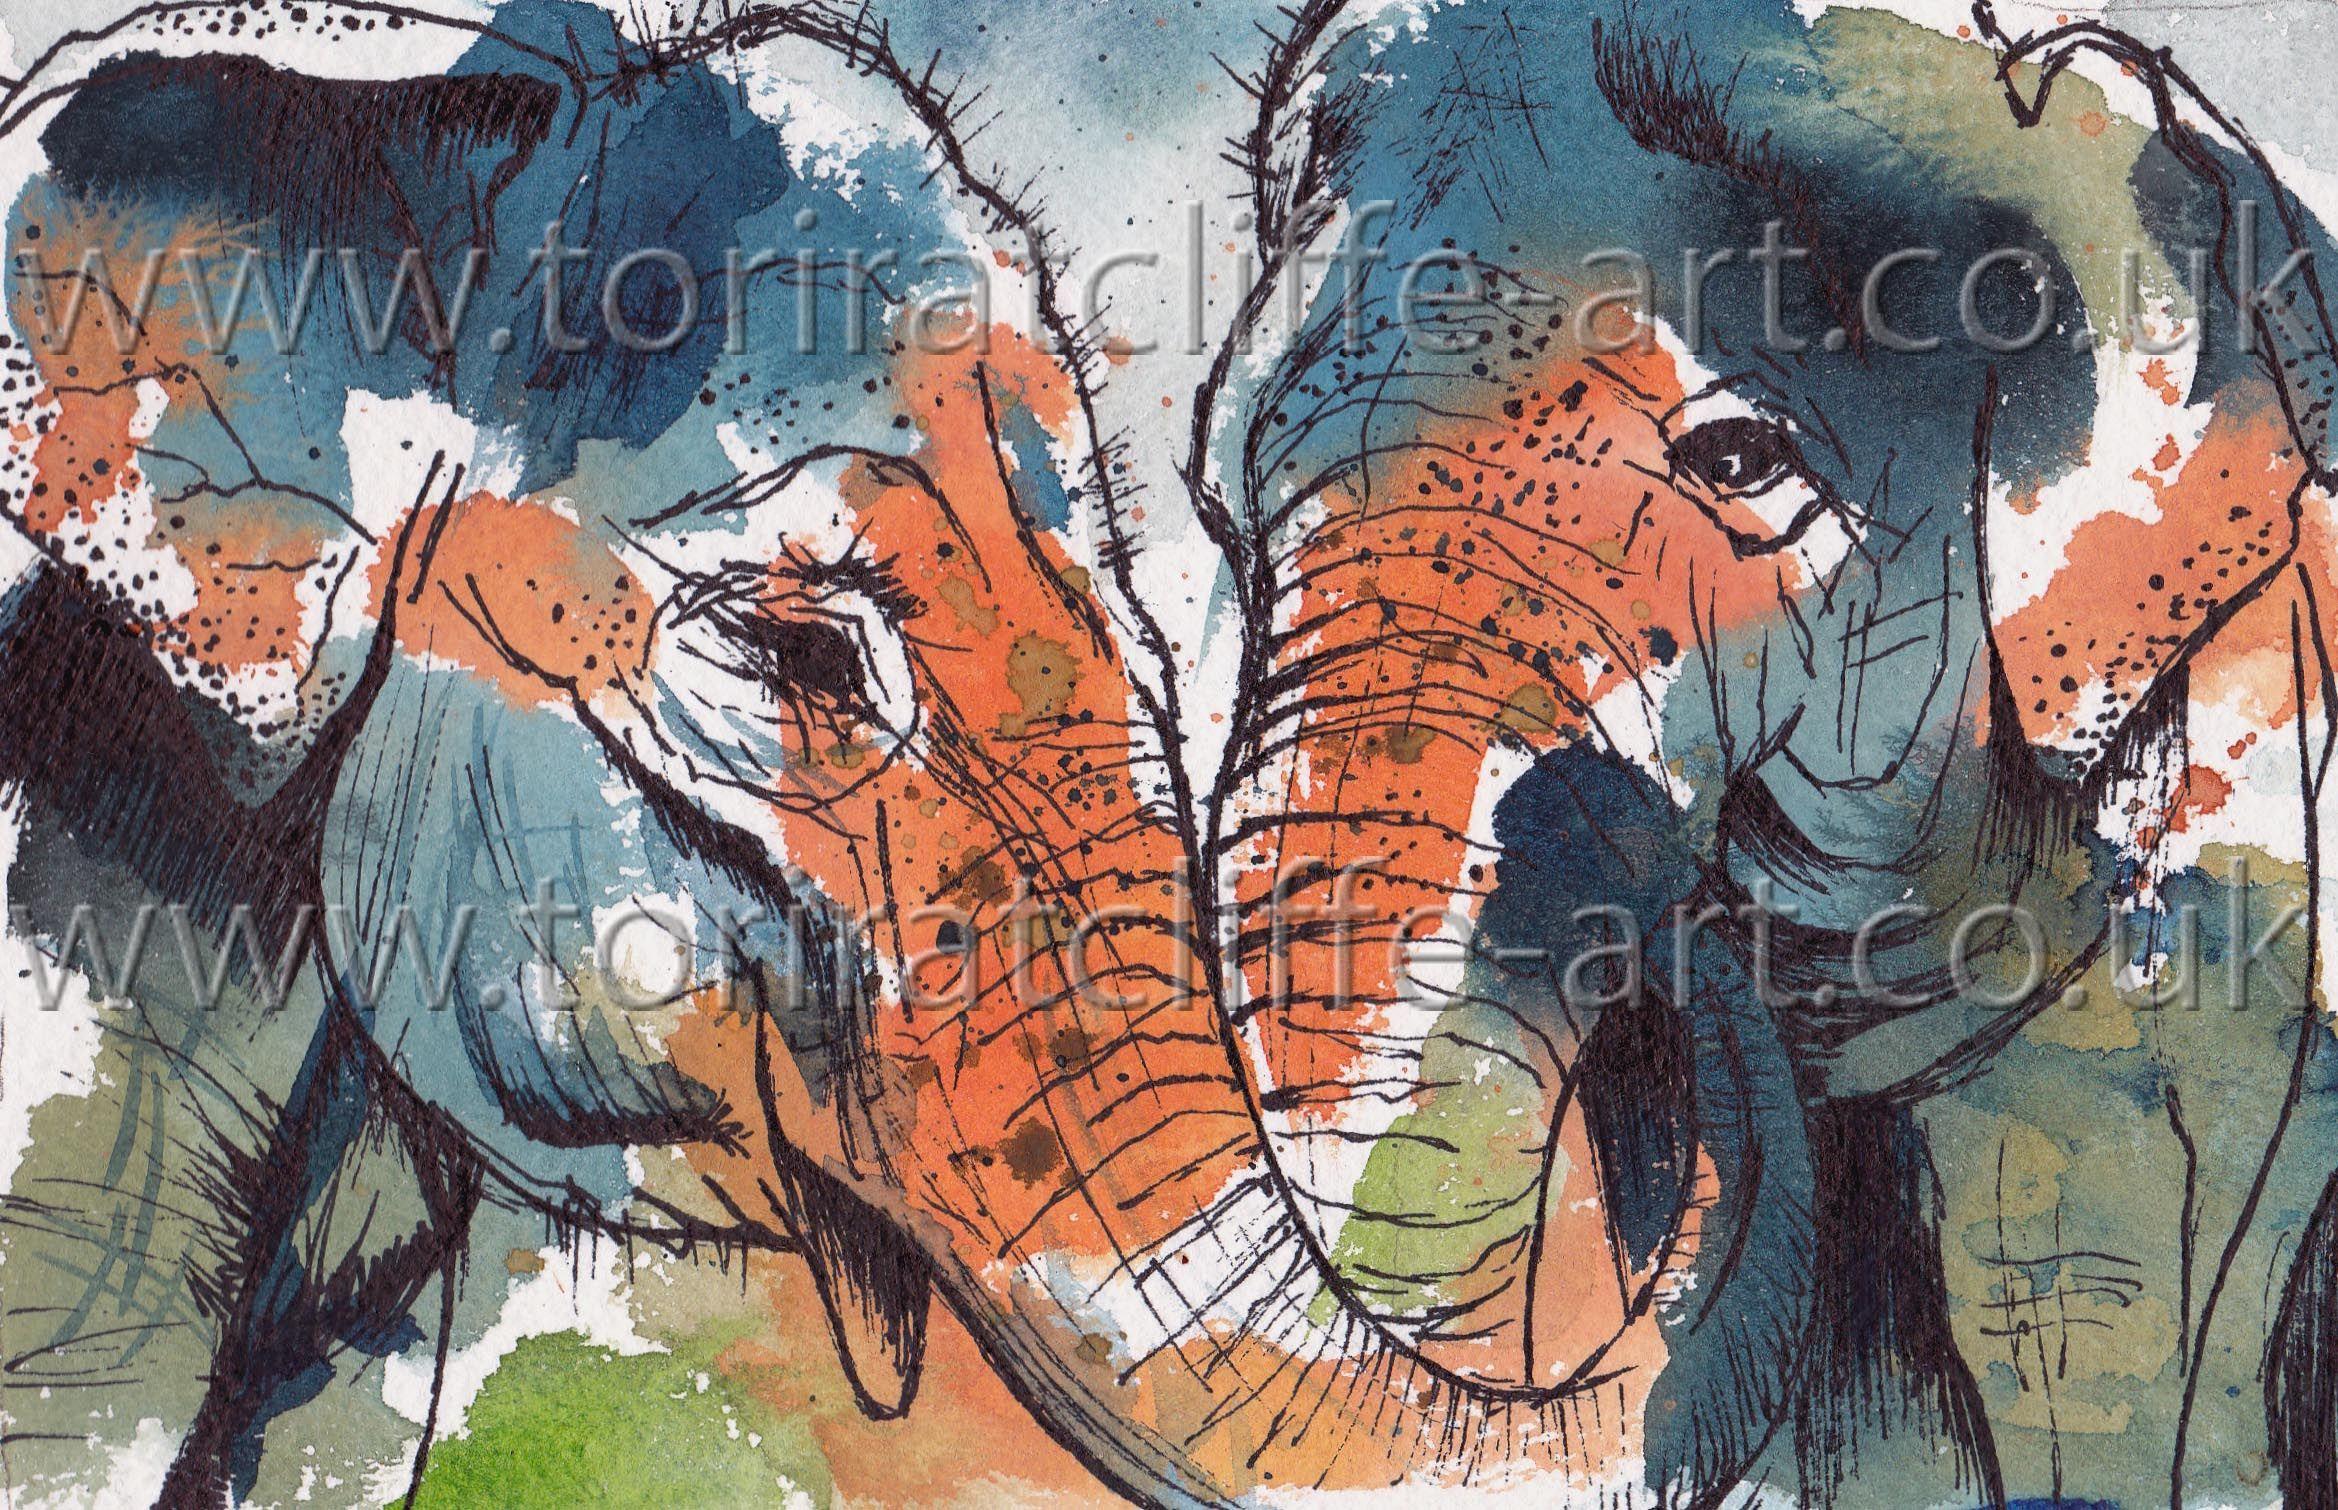 Artwork : Asian Elephants watercolour and fineliner painting  www.toriratcliffe-art.co.uk www.facebook.com/toriratcliffeart